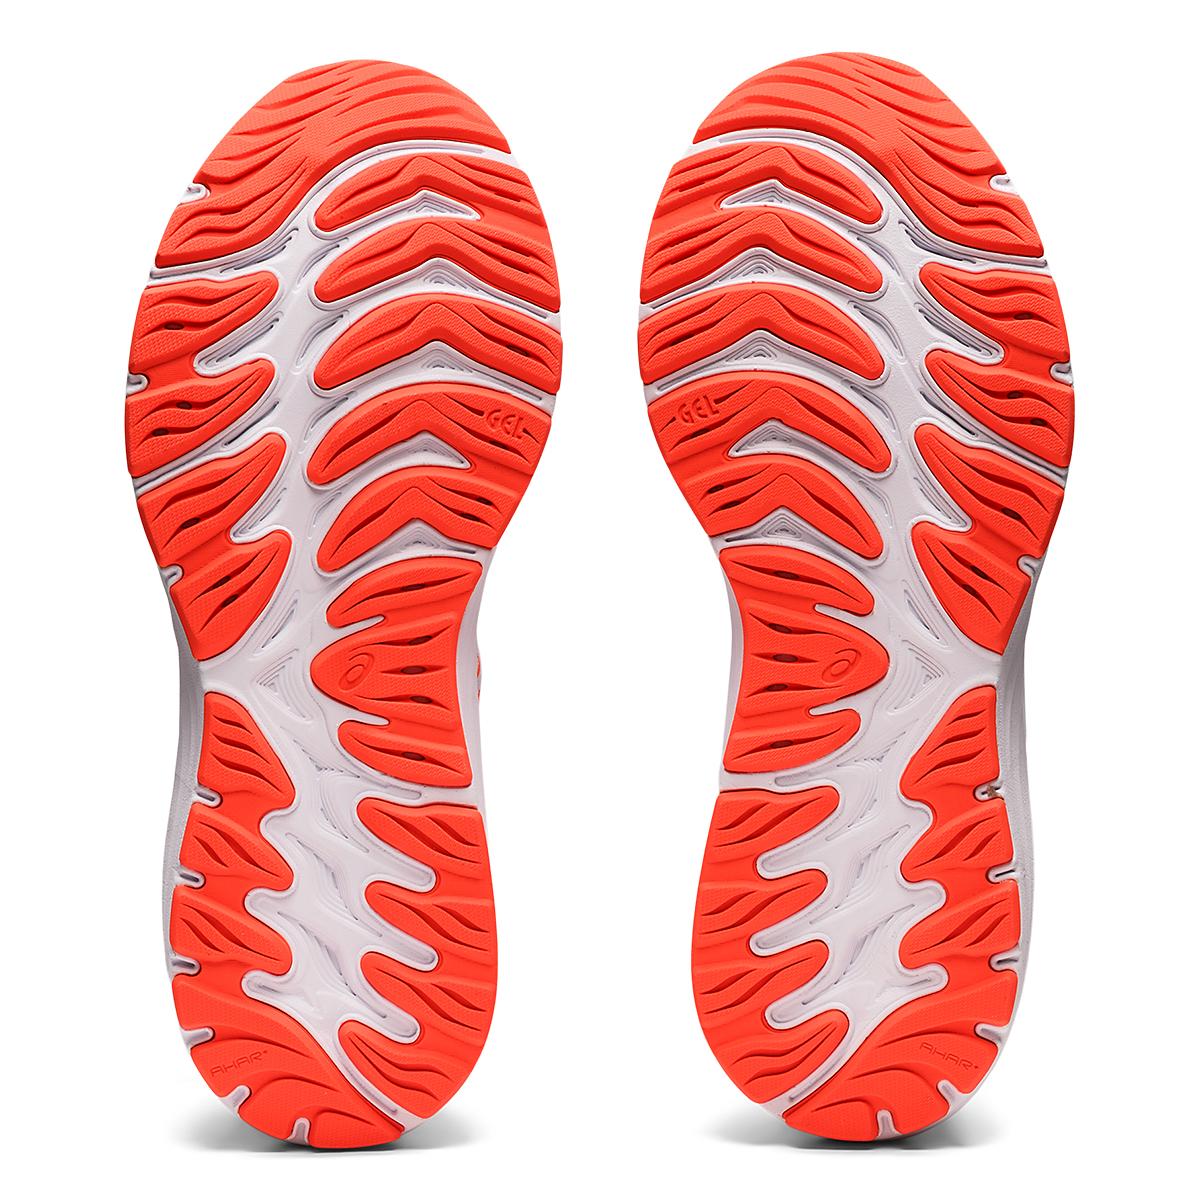 Women's Asics Gel-Cumulus 23 Running Shoe - Color: White/Sky - JackRabbit Exclusive - Size: 5 - Width: Regular, White/Sky - JackRabbit Exclusive, large, image 7